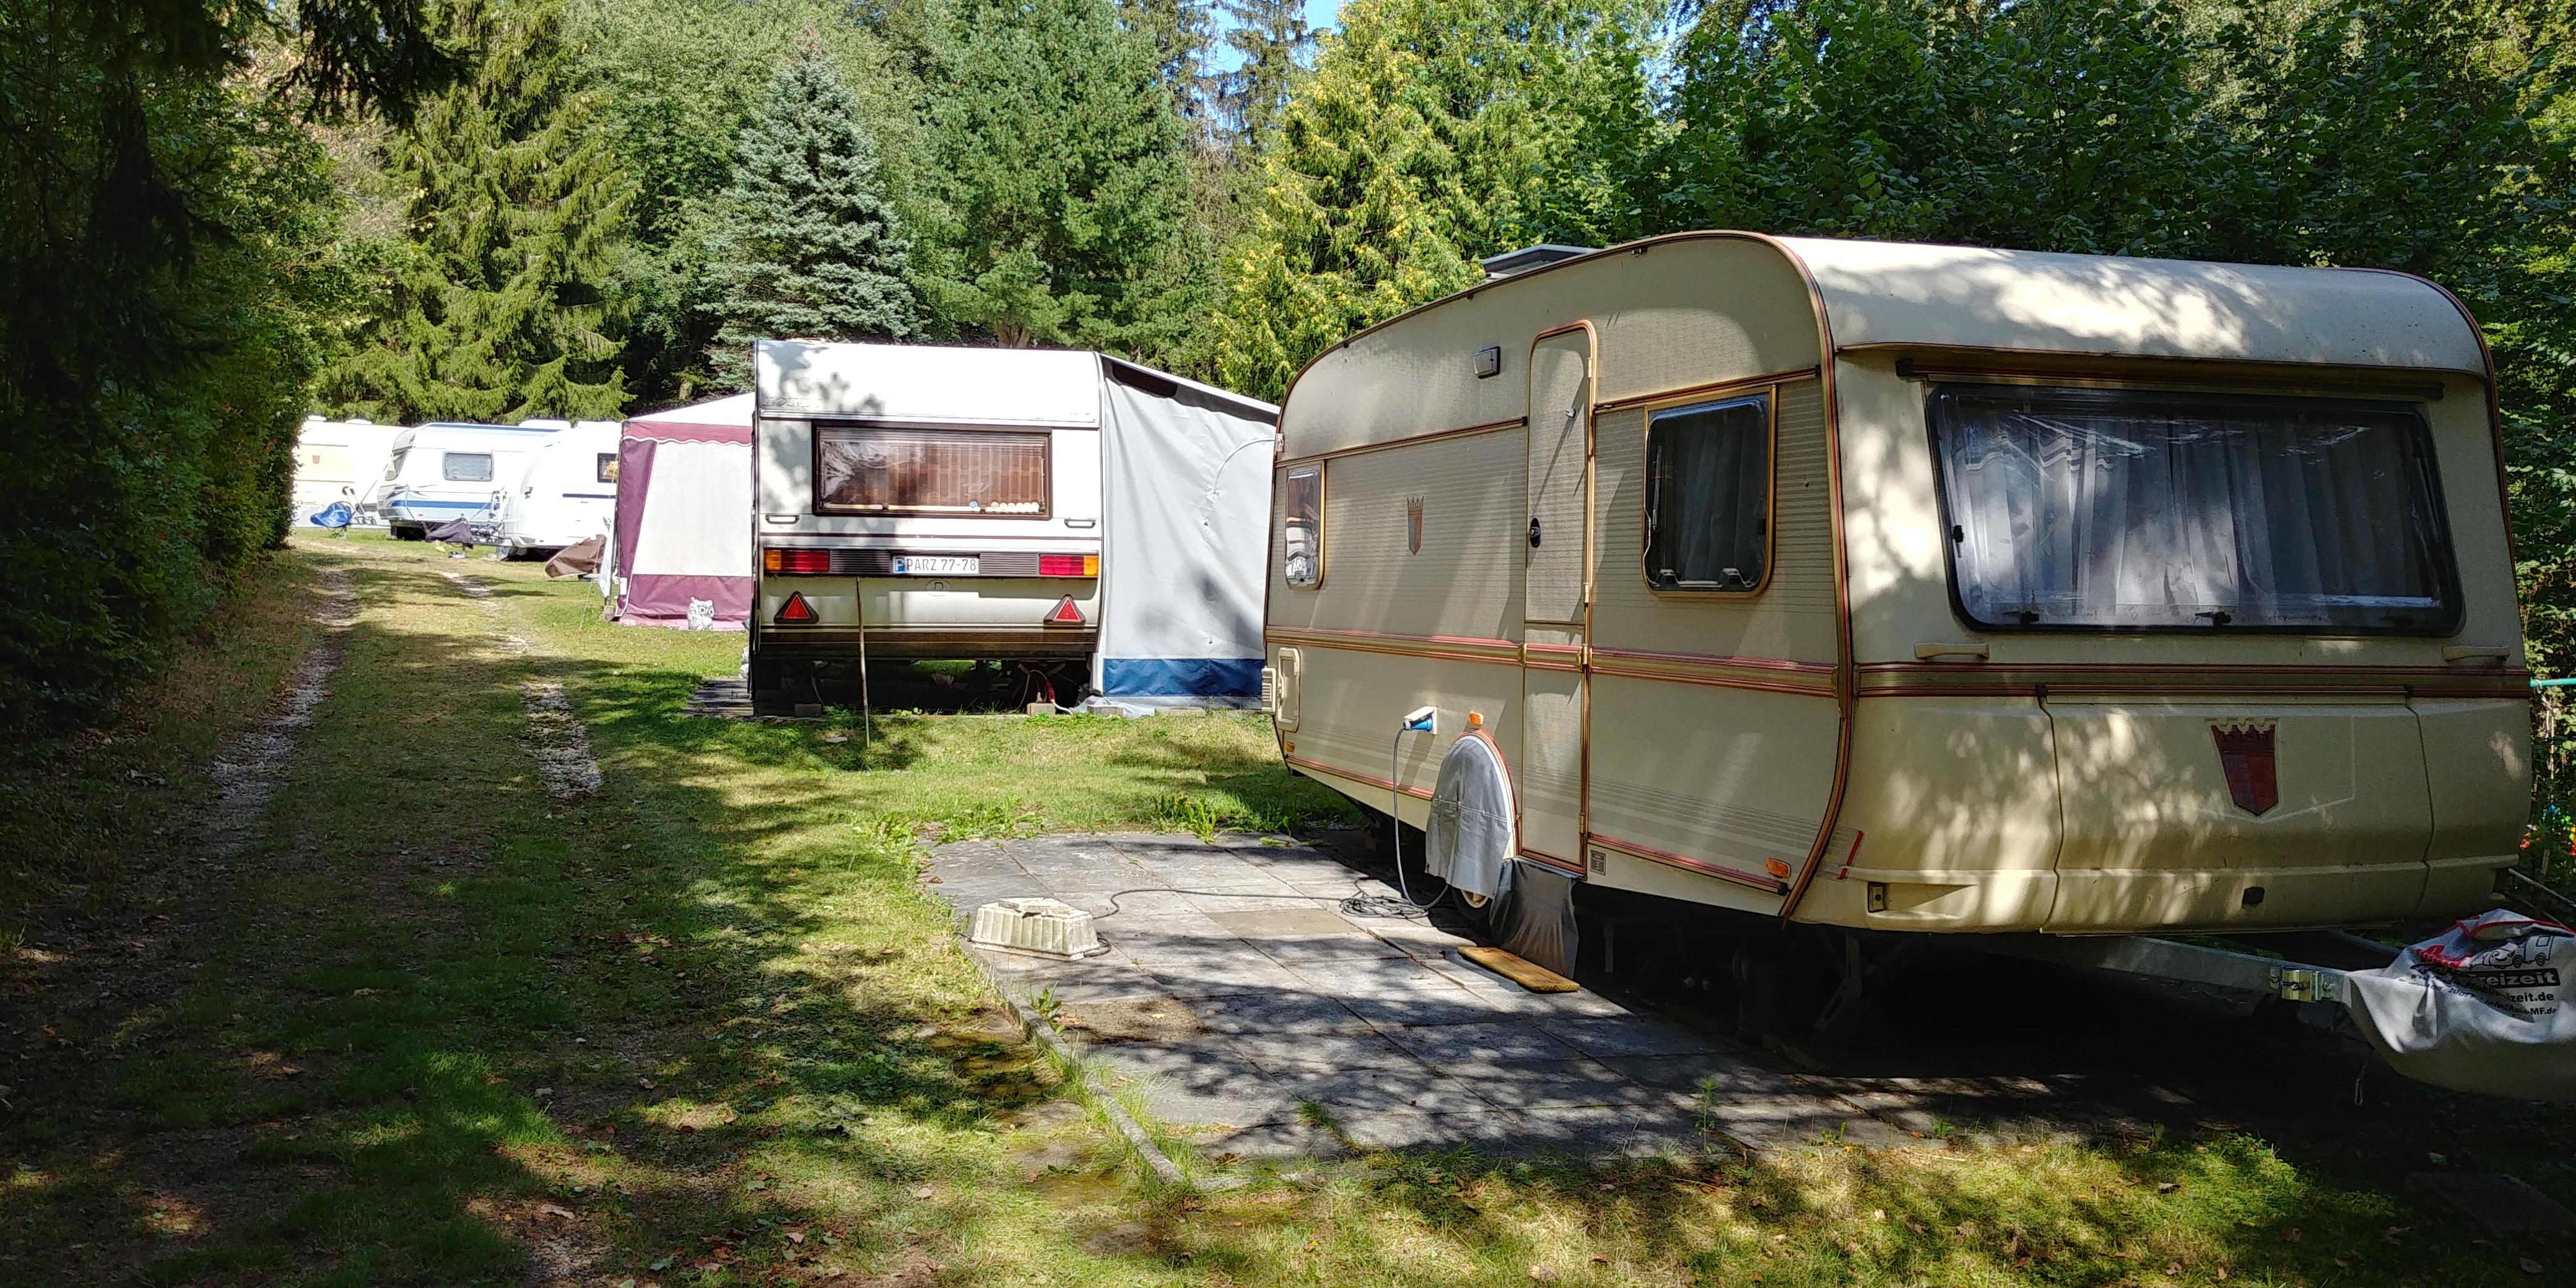 Wiesbaden Camping